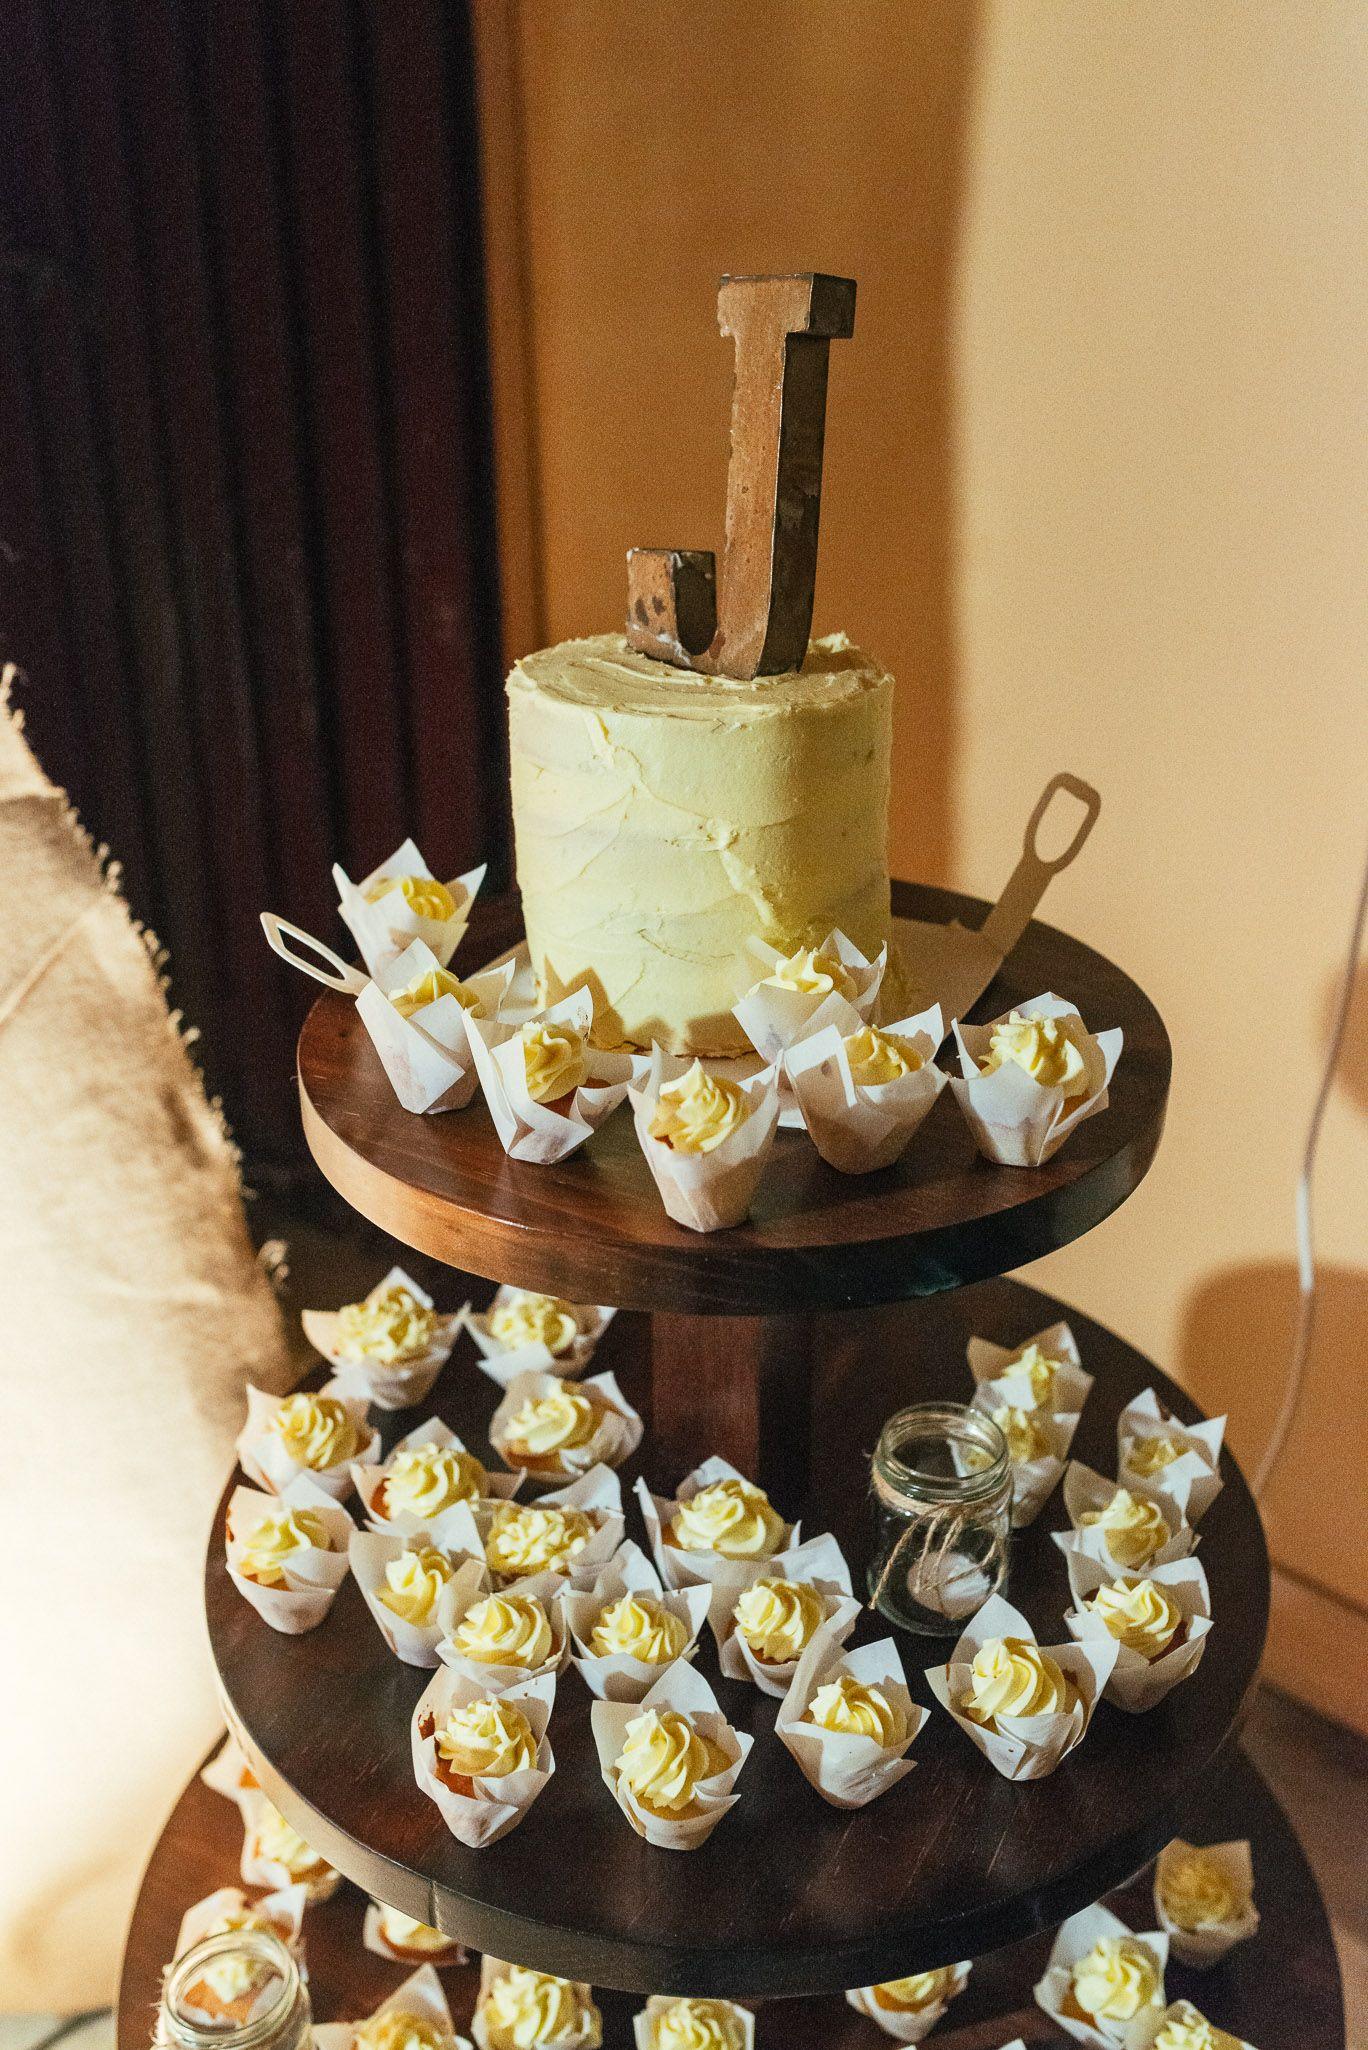 Rustic birthday cake & cupcakes